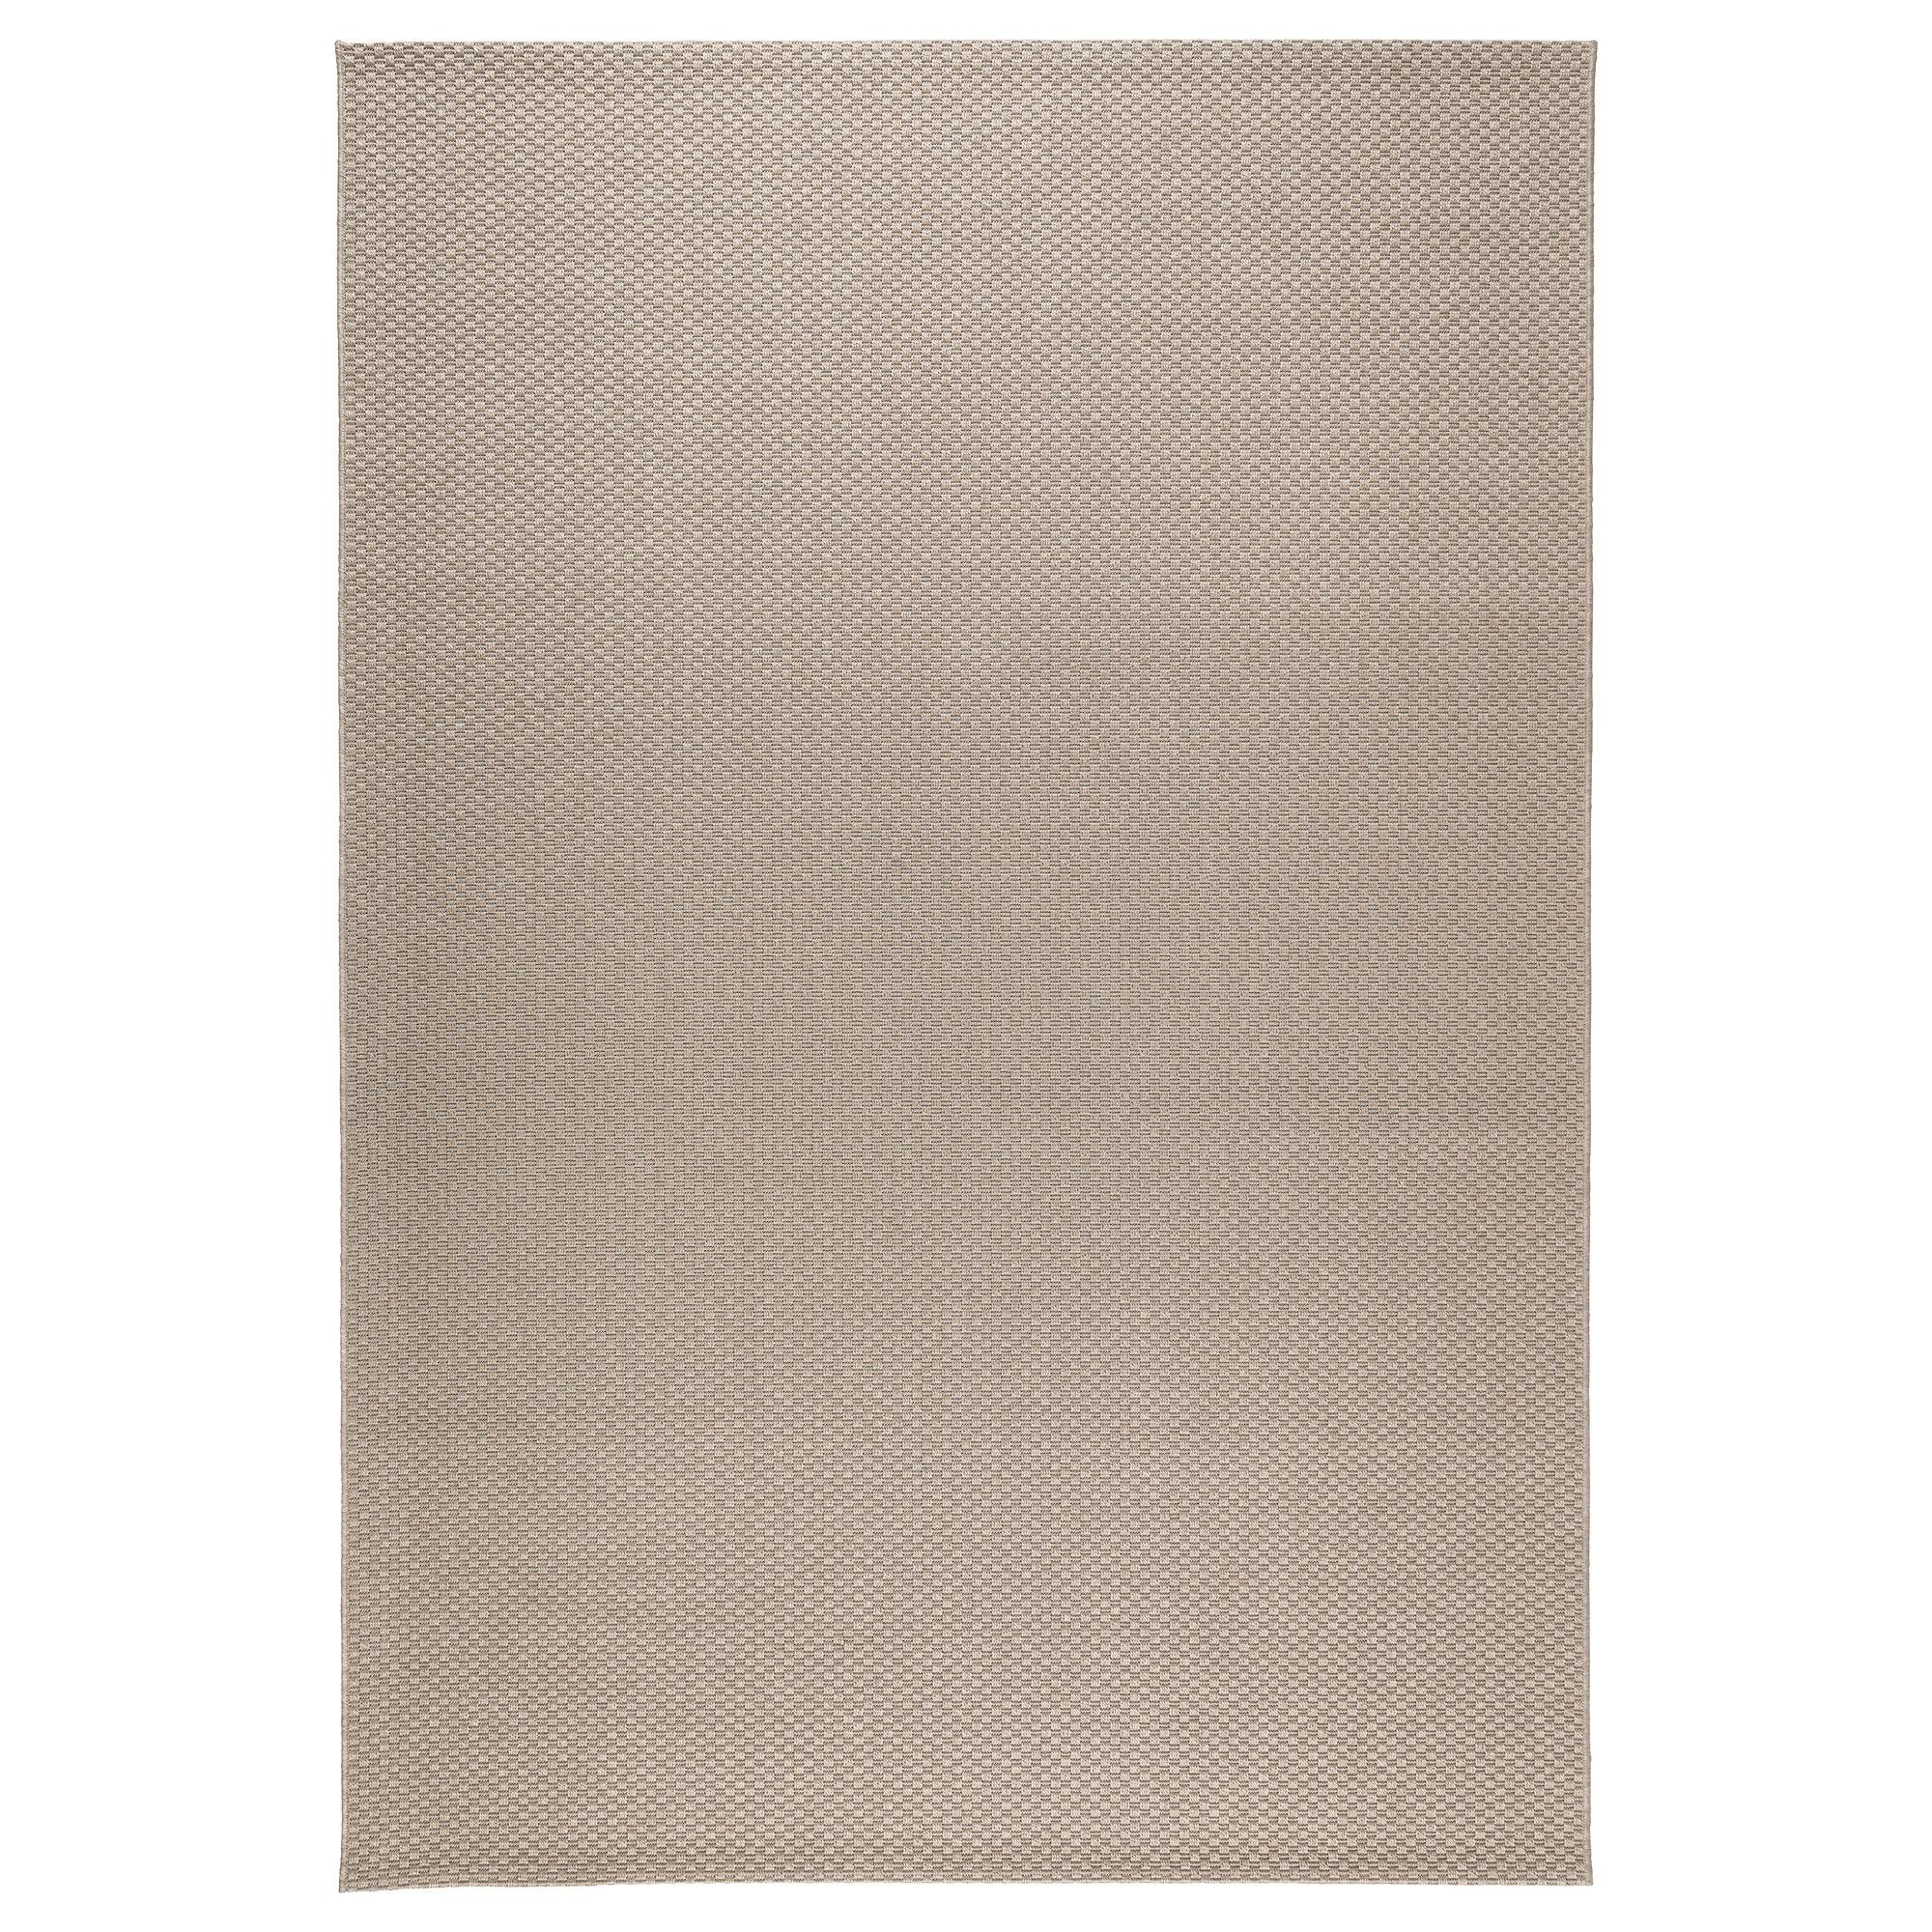 Morum alfombra lisa 160x230 beige for Alfombras exterior ikea